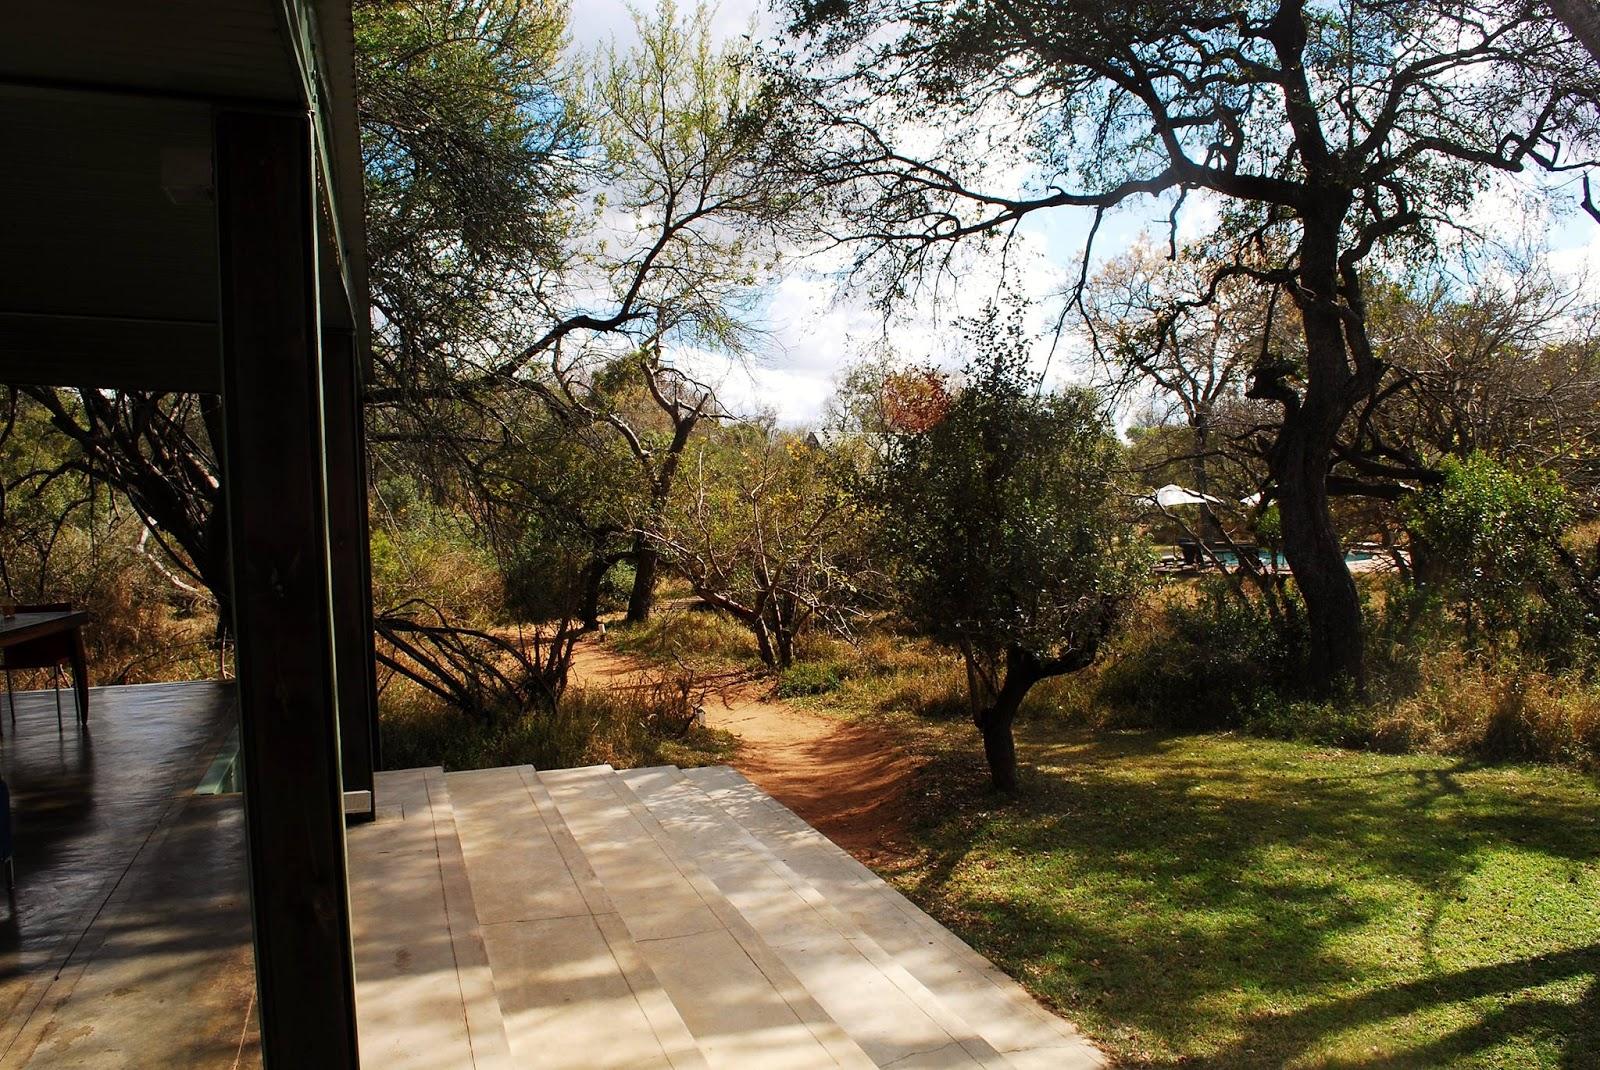 safari, camp, balcony, south africa, travel